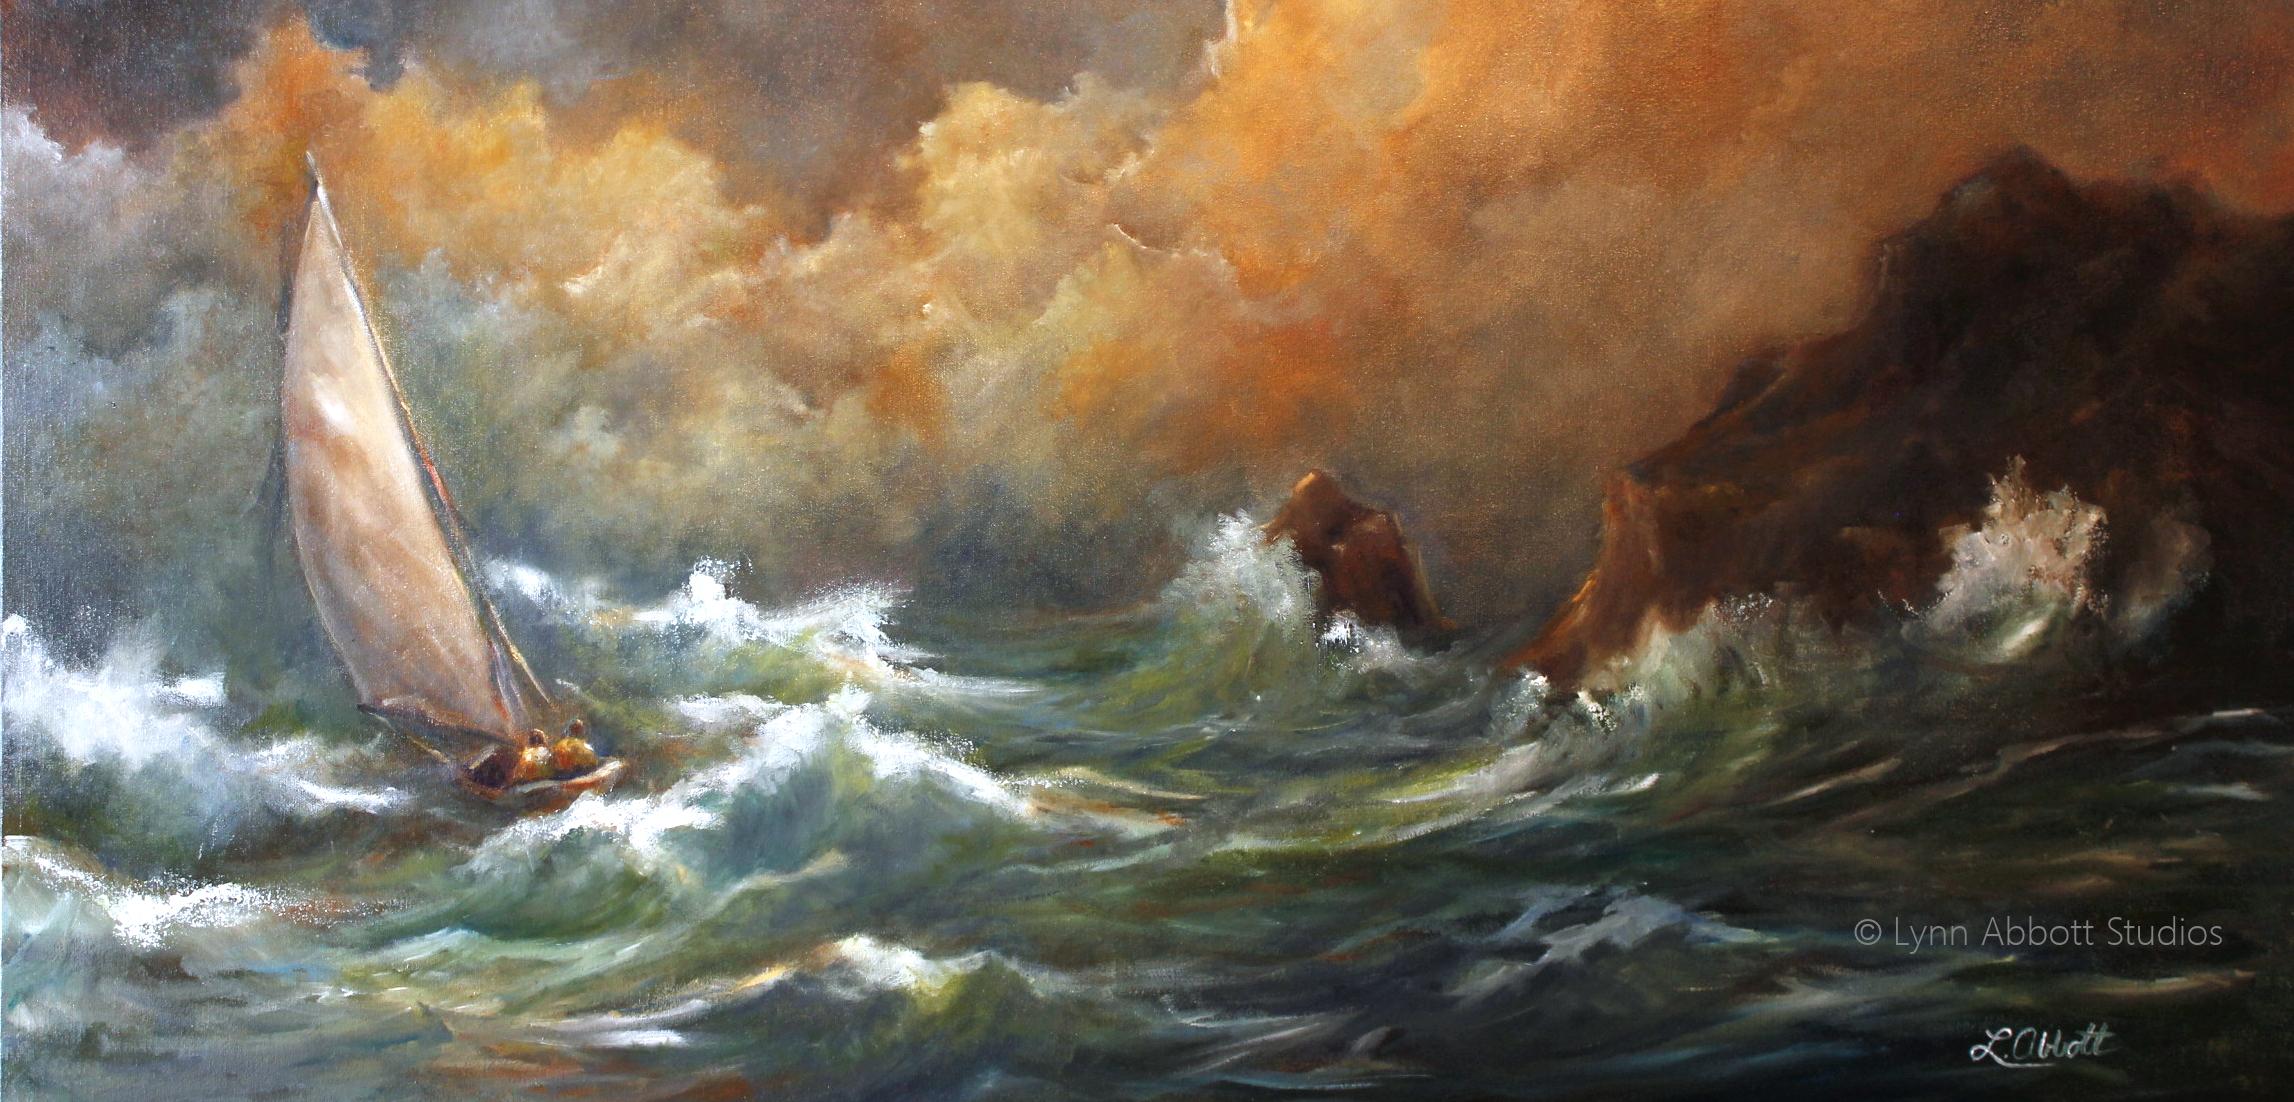 Through the Storm, Lynn Abbott